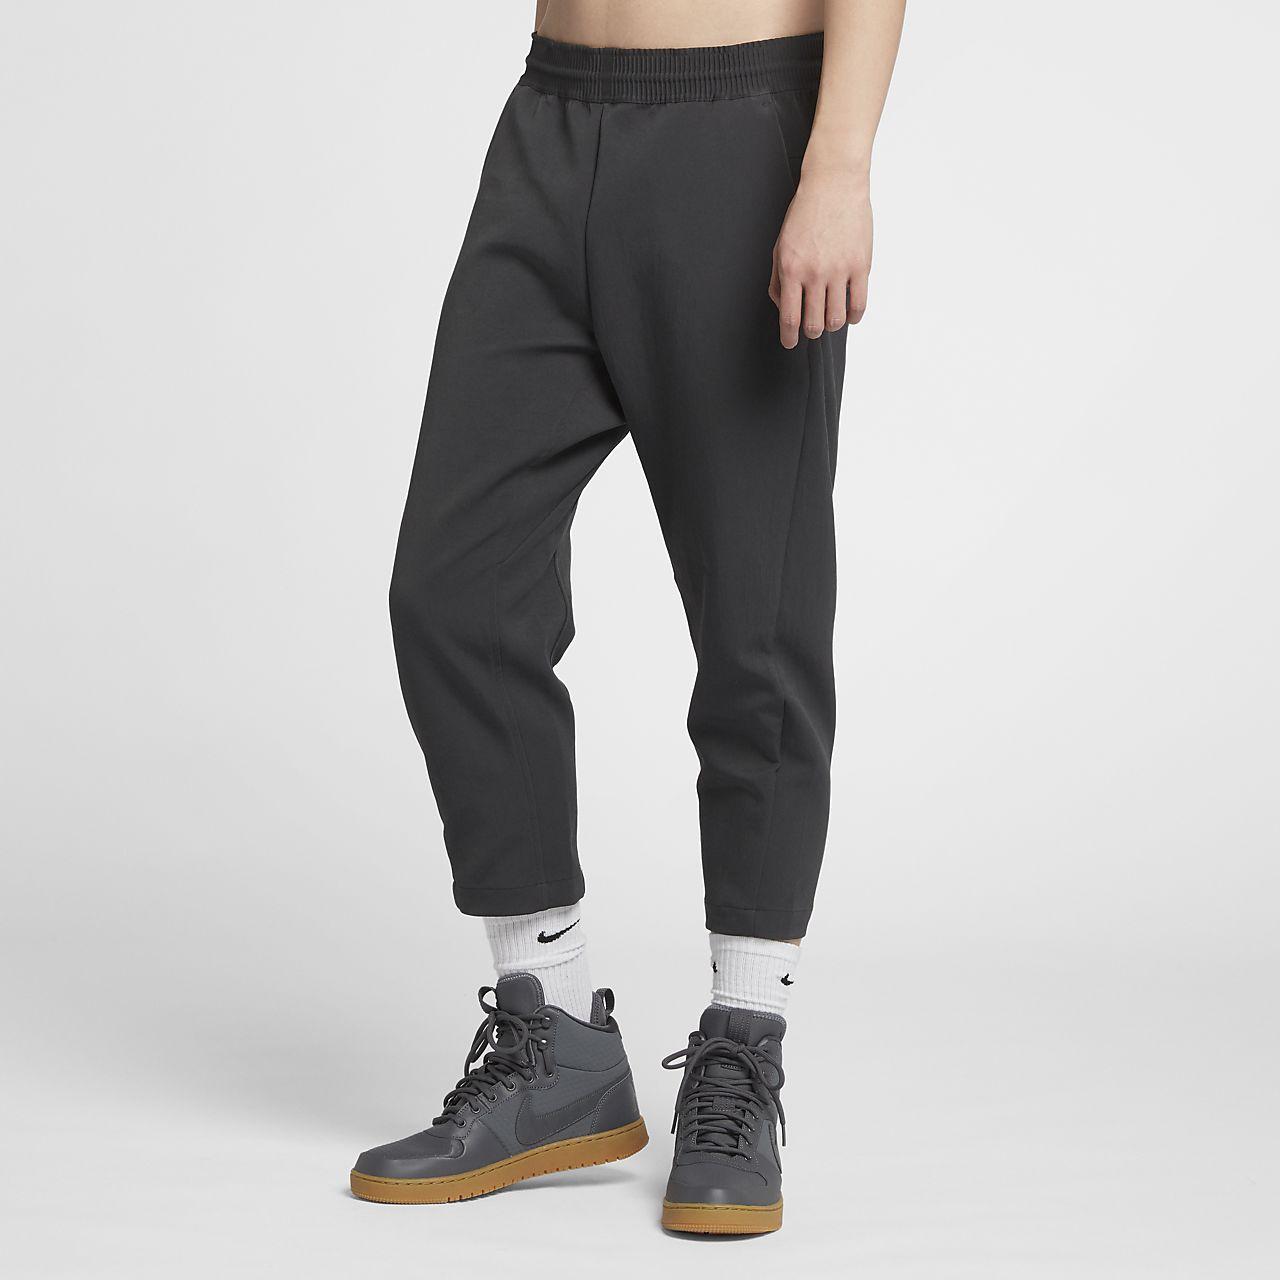 923cfb3121548a Nike Sportswear Tech Pack Men s Cropped Woven Trousers. Nike.com SG